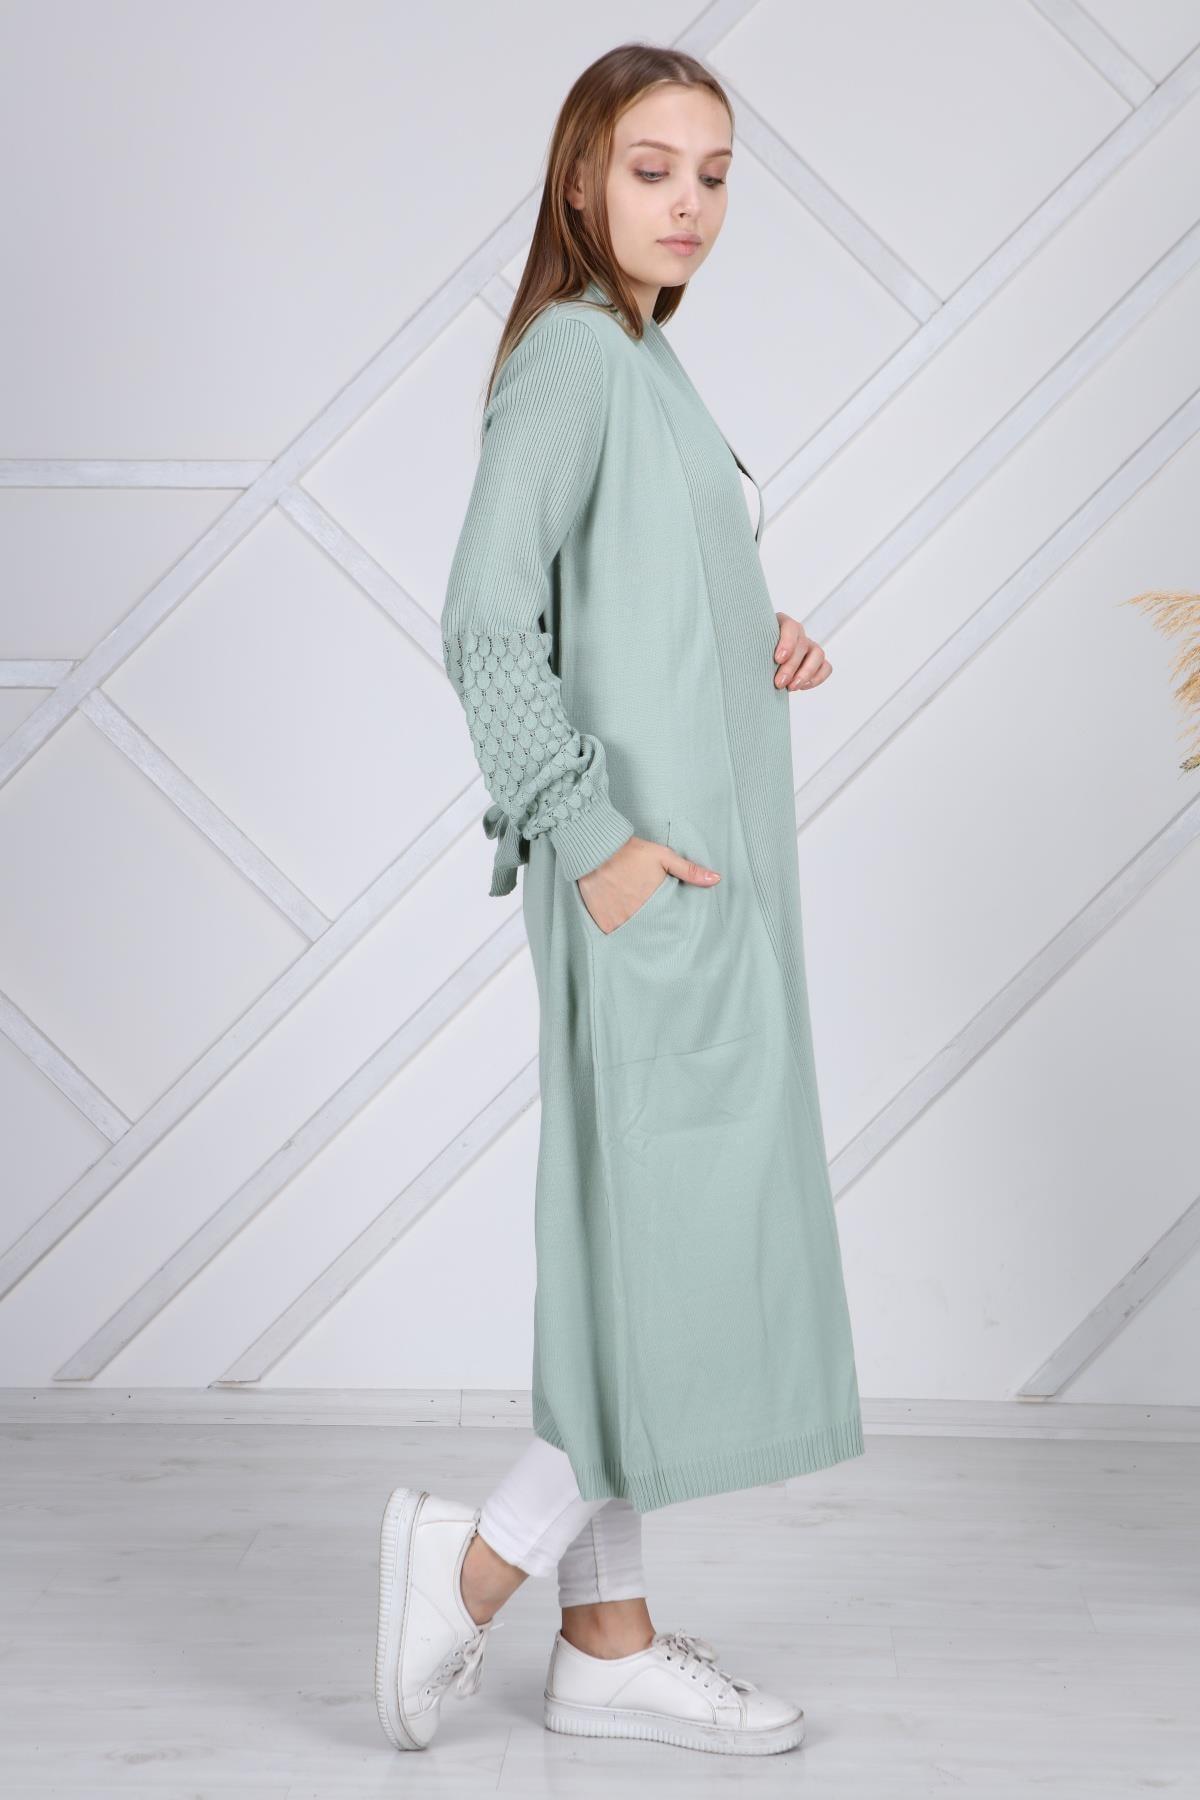 şeymaebrar Kadın Mint Yeşili Kol Detaylı Triko Uzun Hırka 1